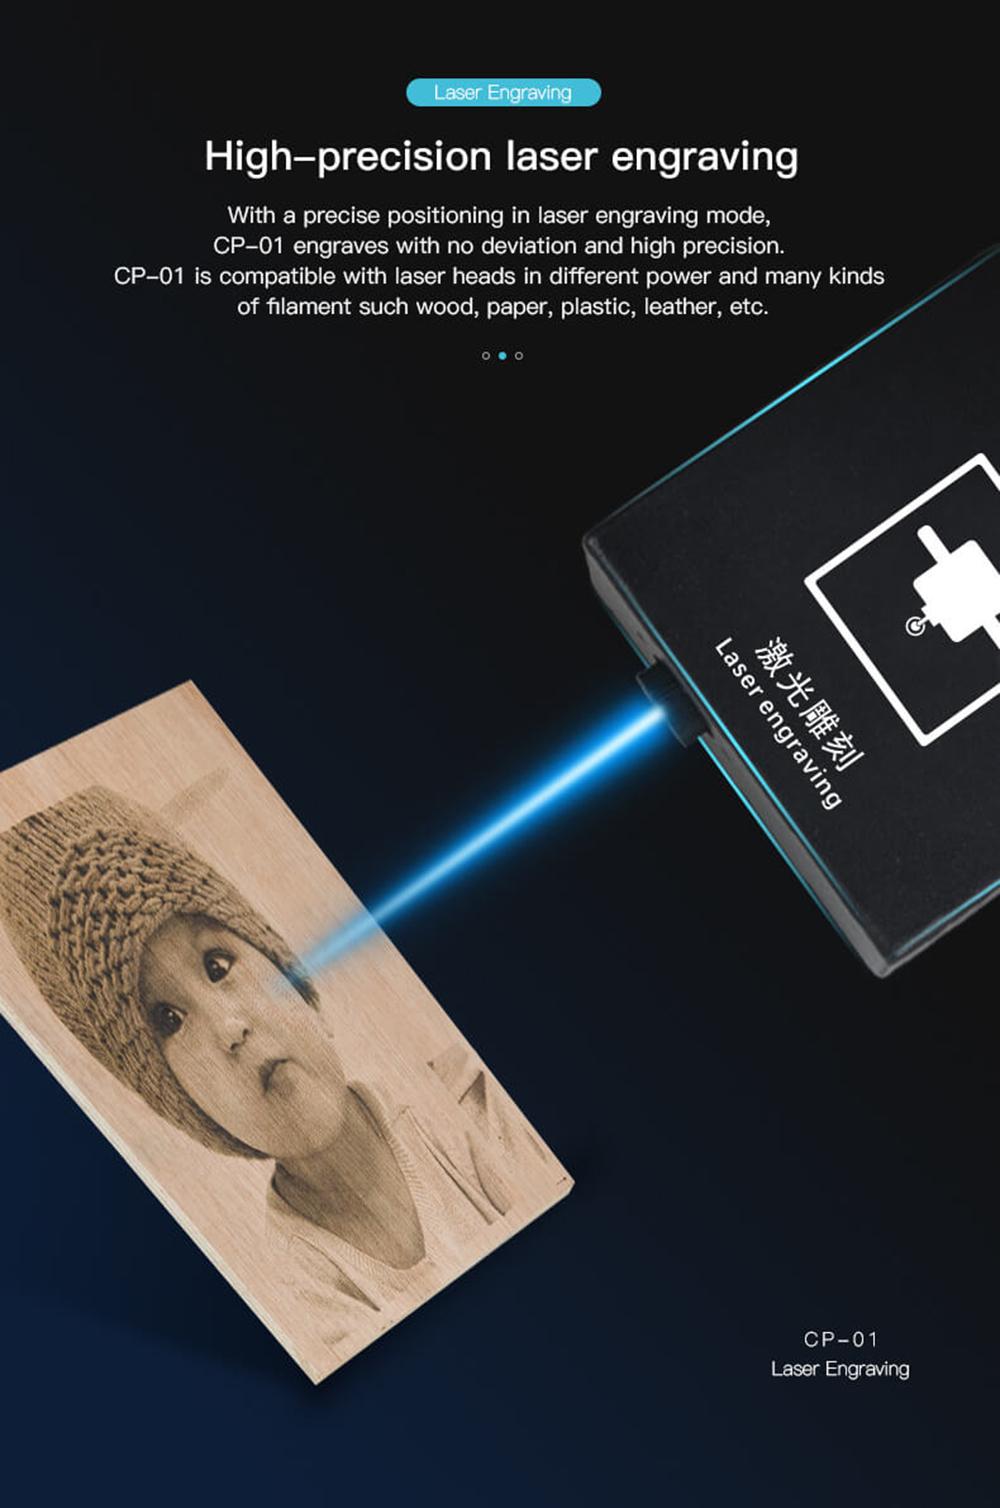 Creality3D CP-01 Multitool 3D-Drucker Bausatz - 200x200x200mm - Hochpräzise Laser Gravur